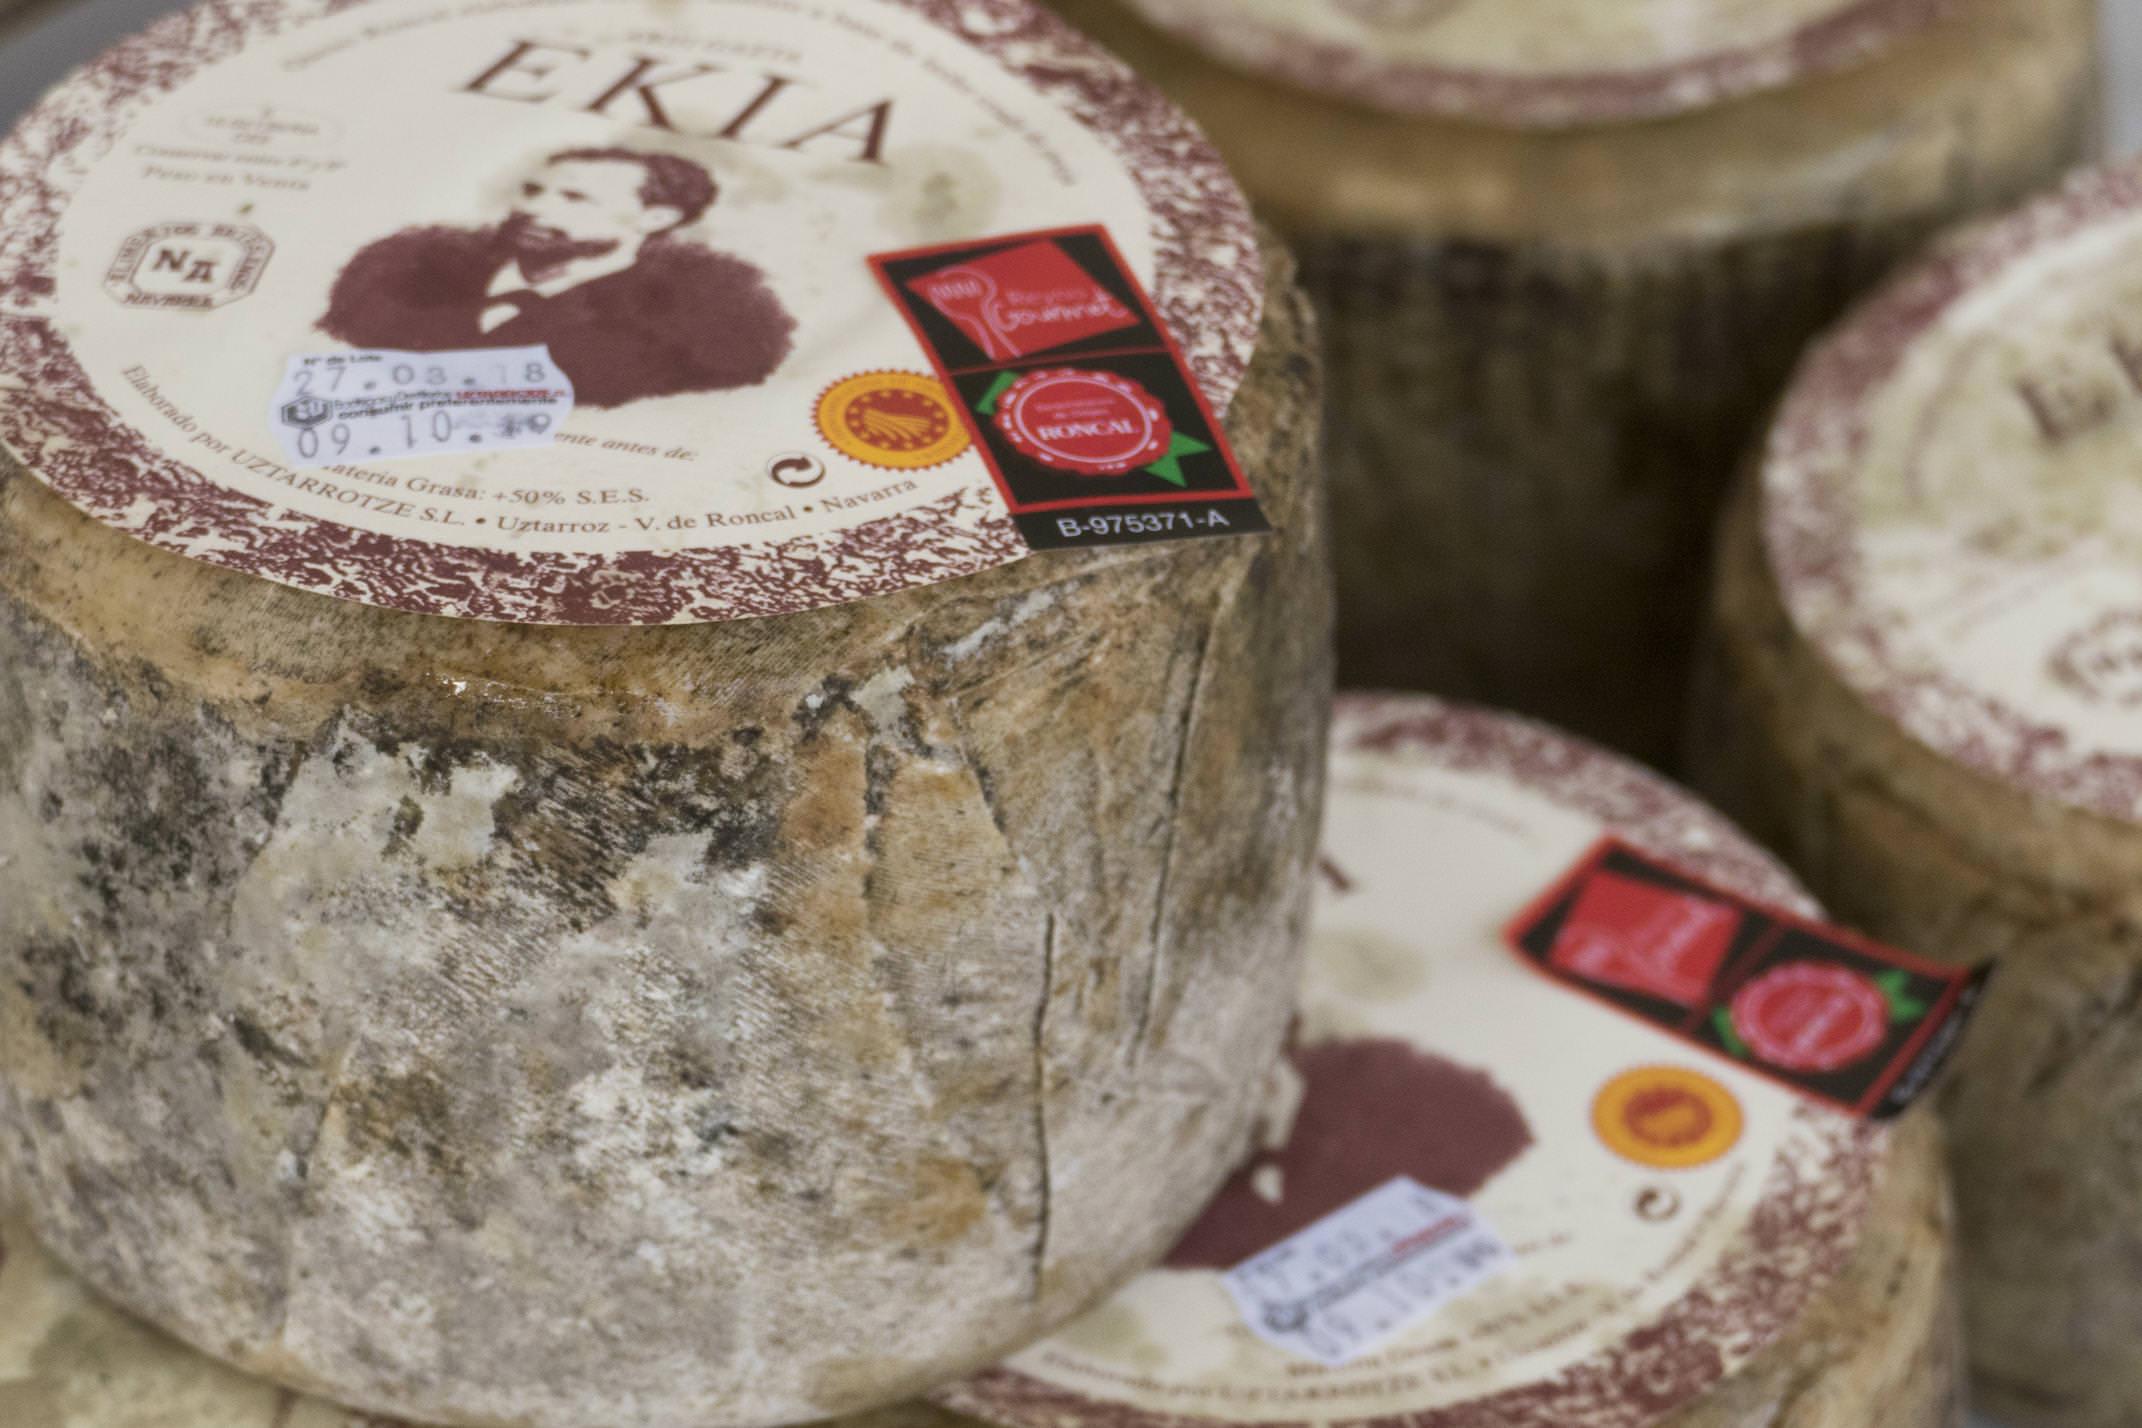 Spain navarre basque roncal cheese market c diego